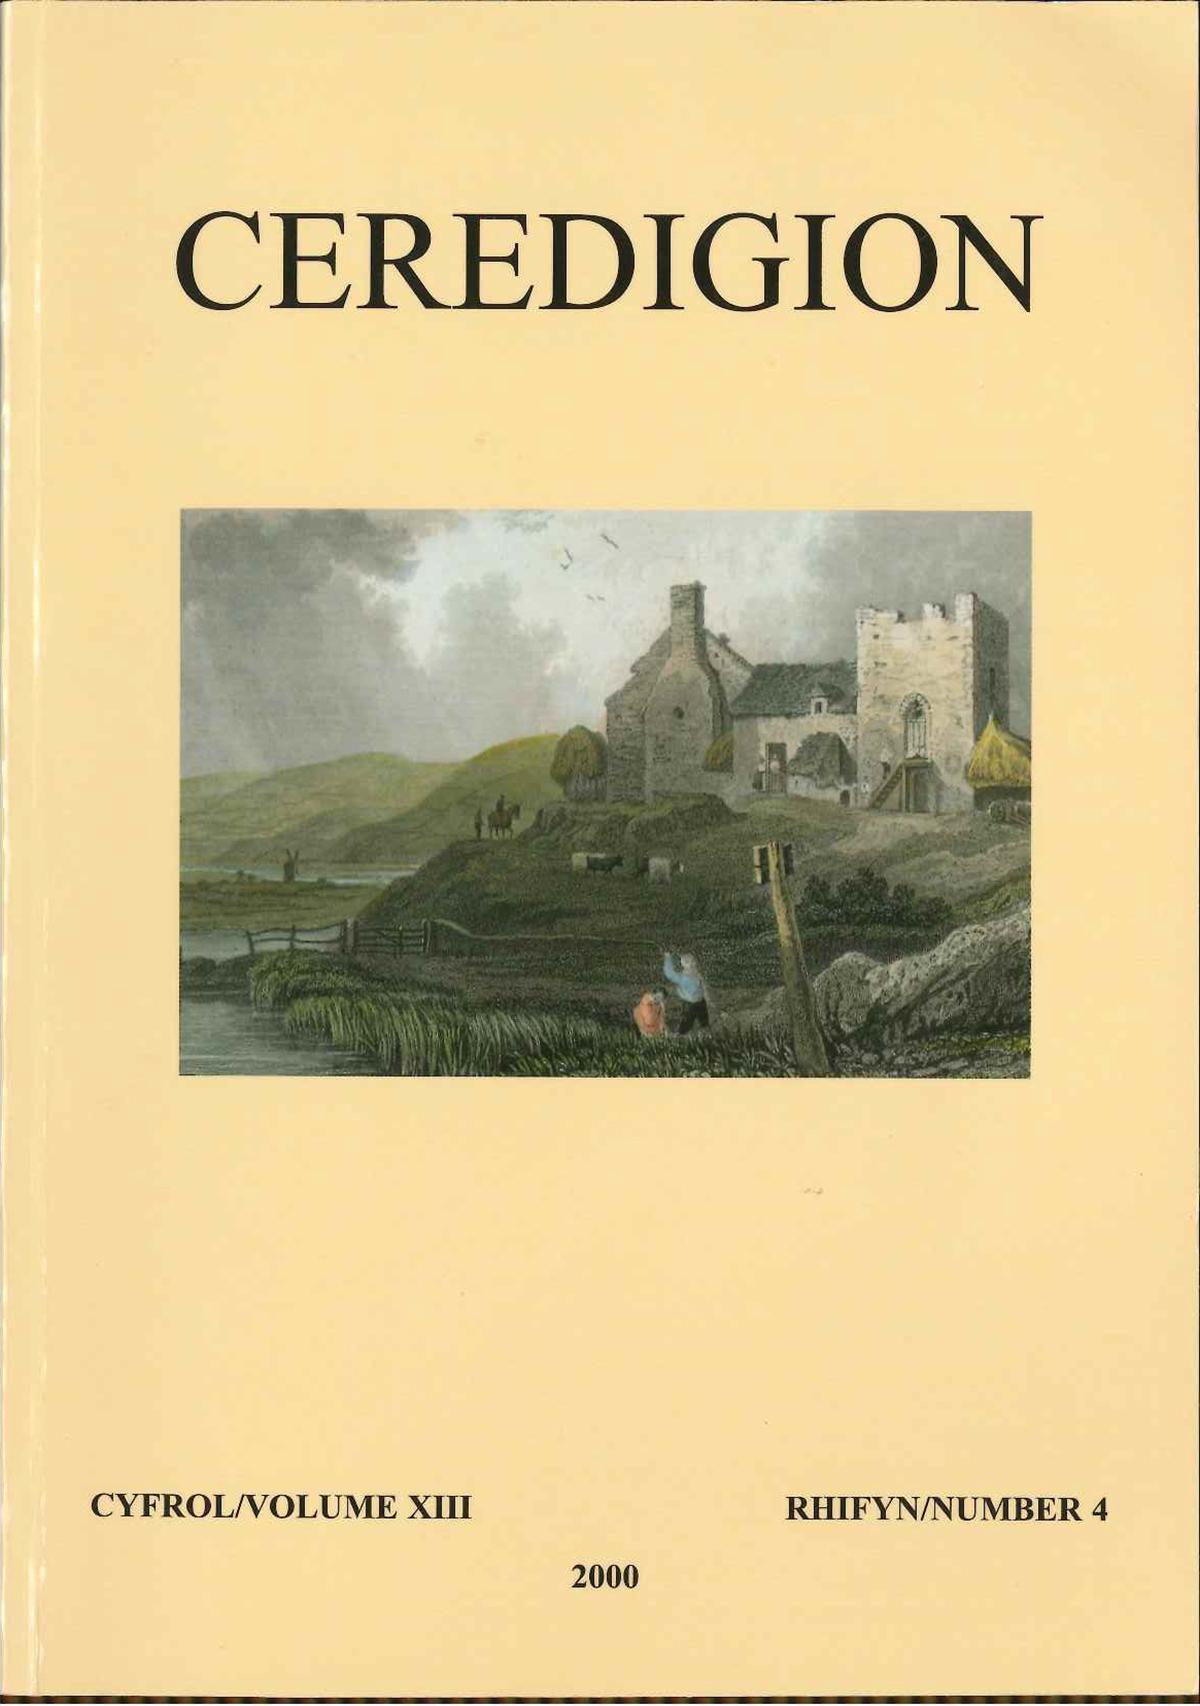 Ceredigion Journal of the Ceredigion Antiquarian Society Vol XIII, No 4 2000 - ISBN 0069 2263